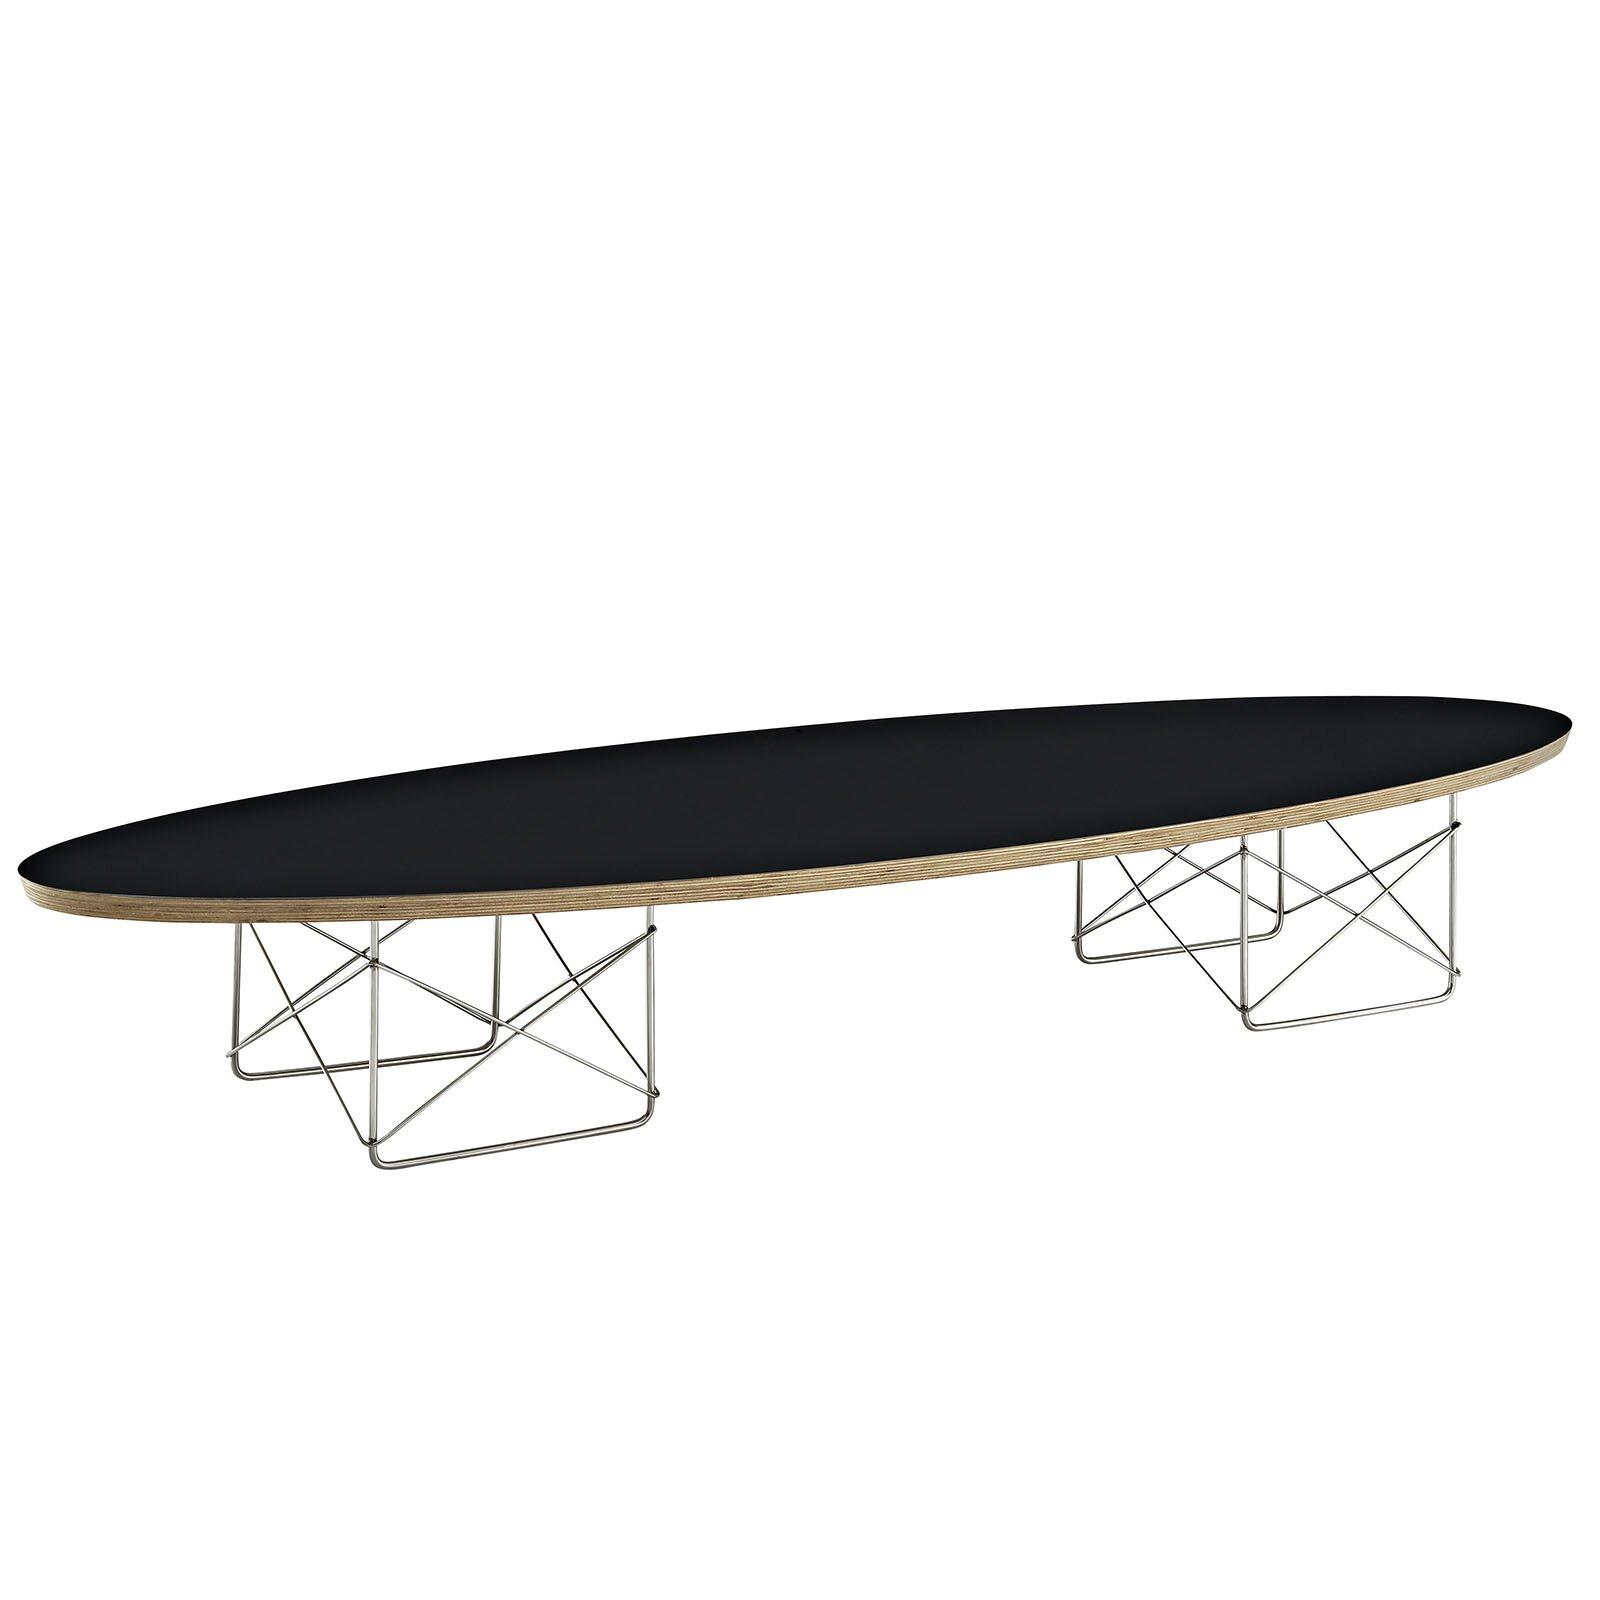 Modway surfboard coffee table reviews wayfair for Surfboard coffee table